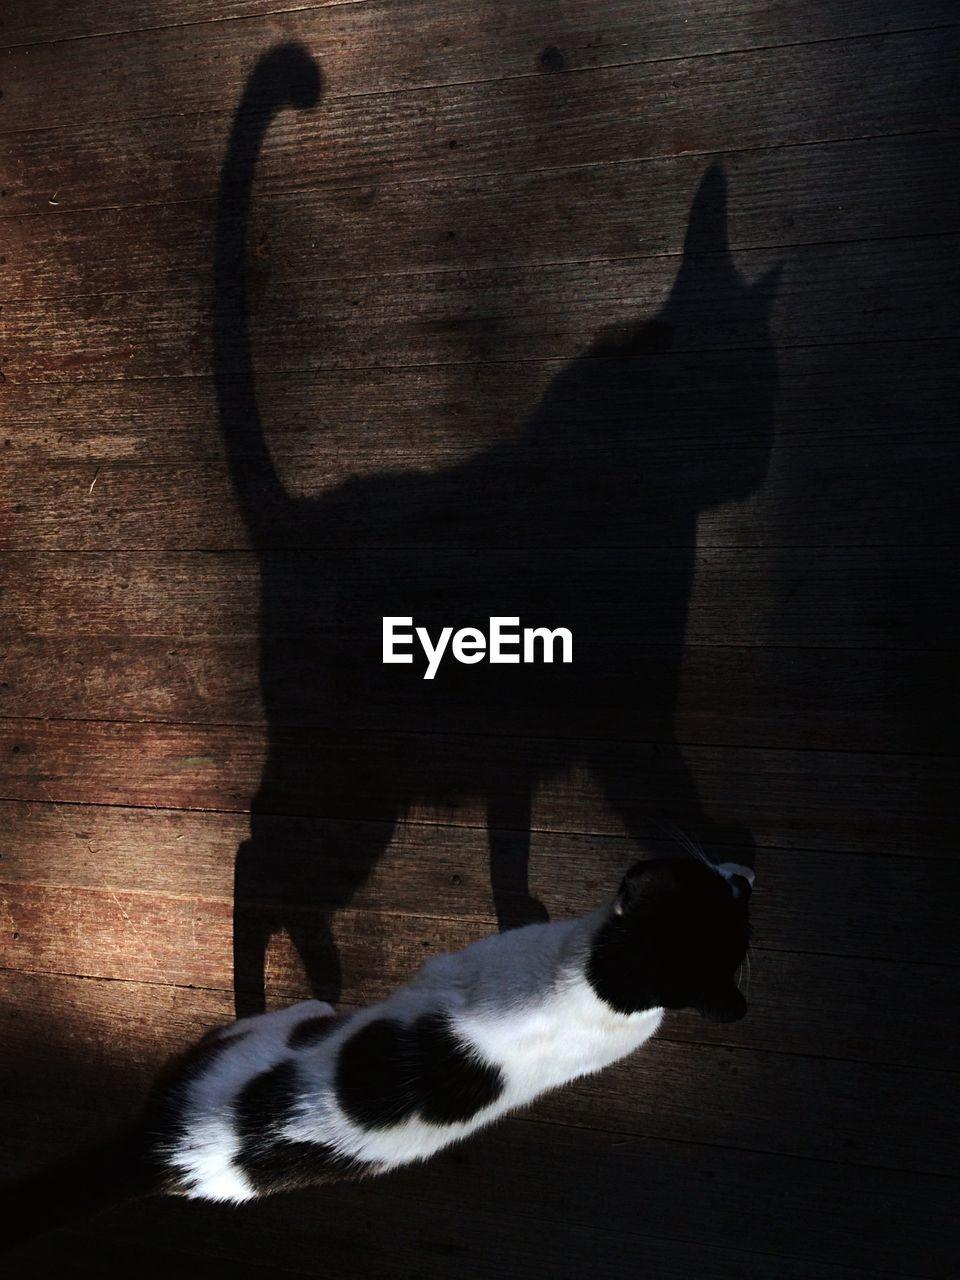 Shadow of cat on hardwood floor